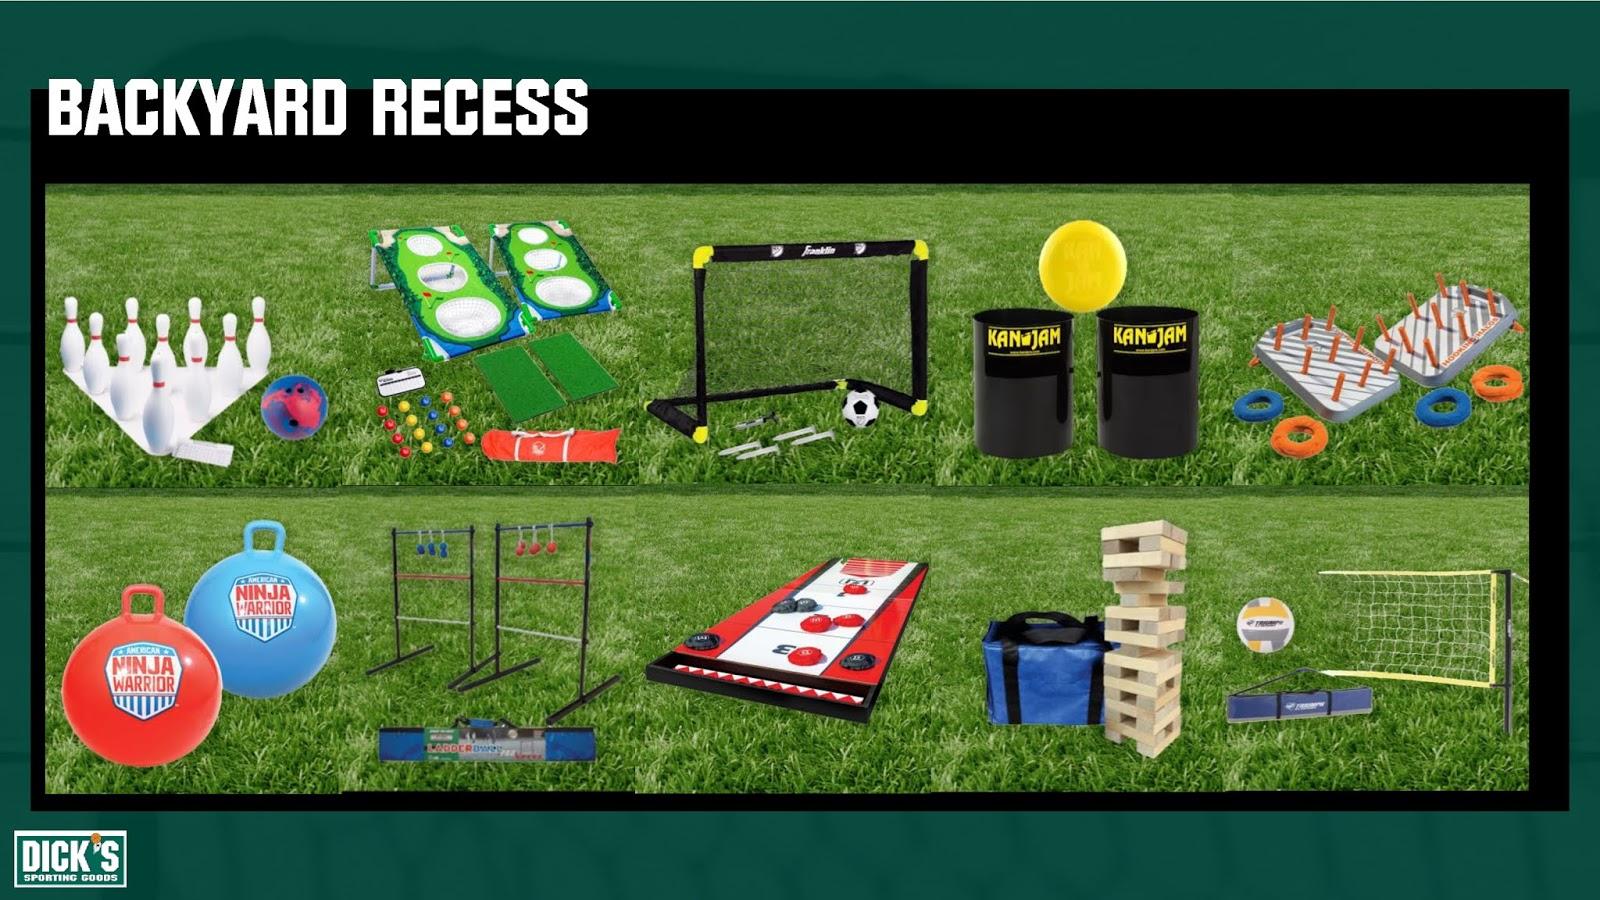 Backyard Recess at DICK'S Sporting Goods